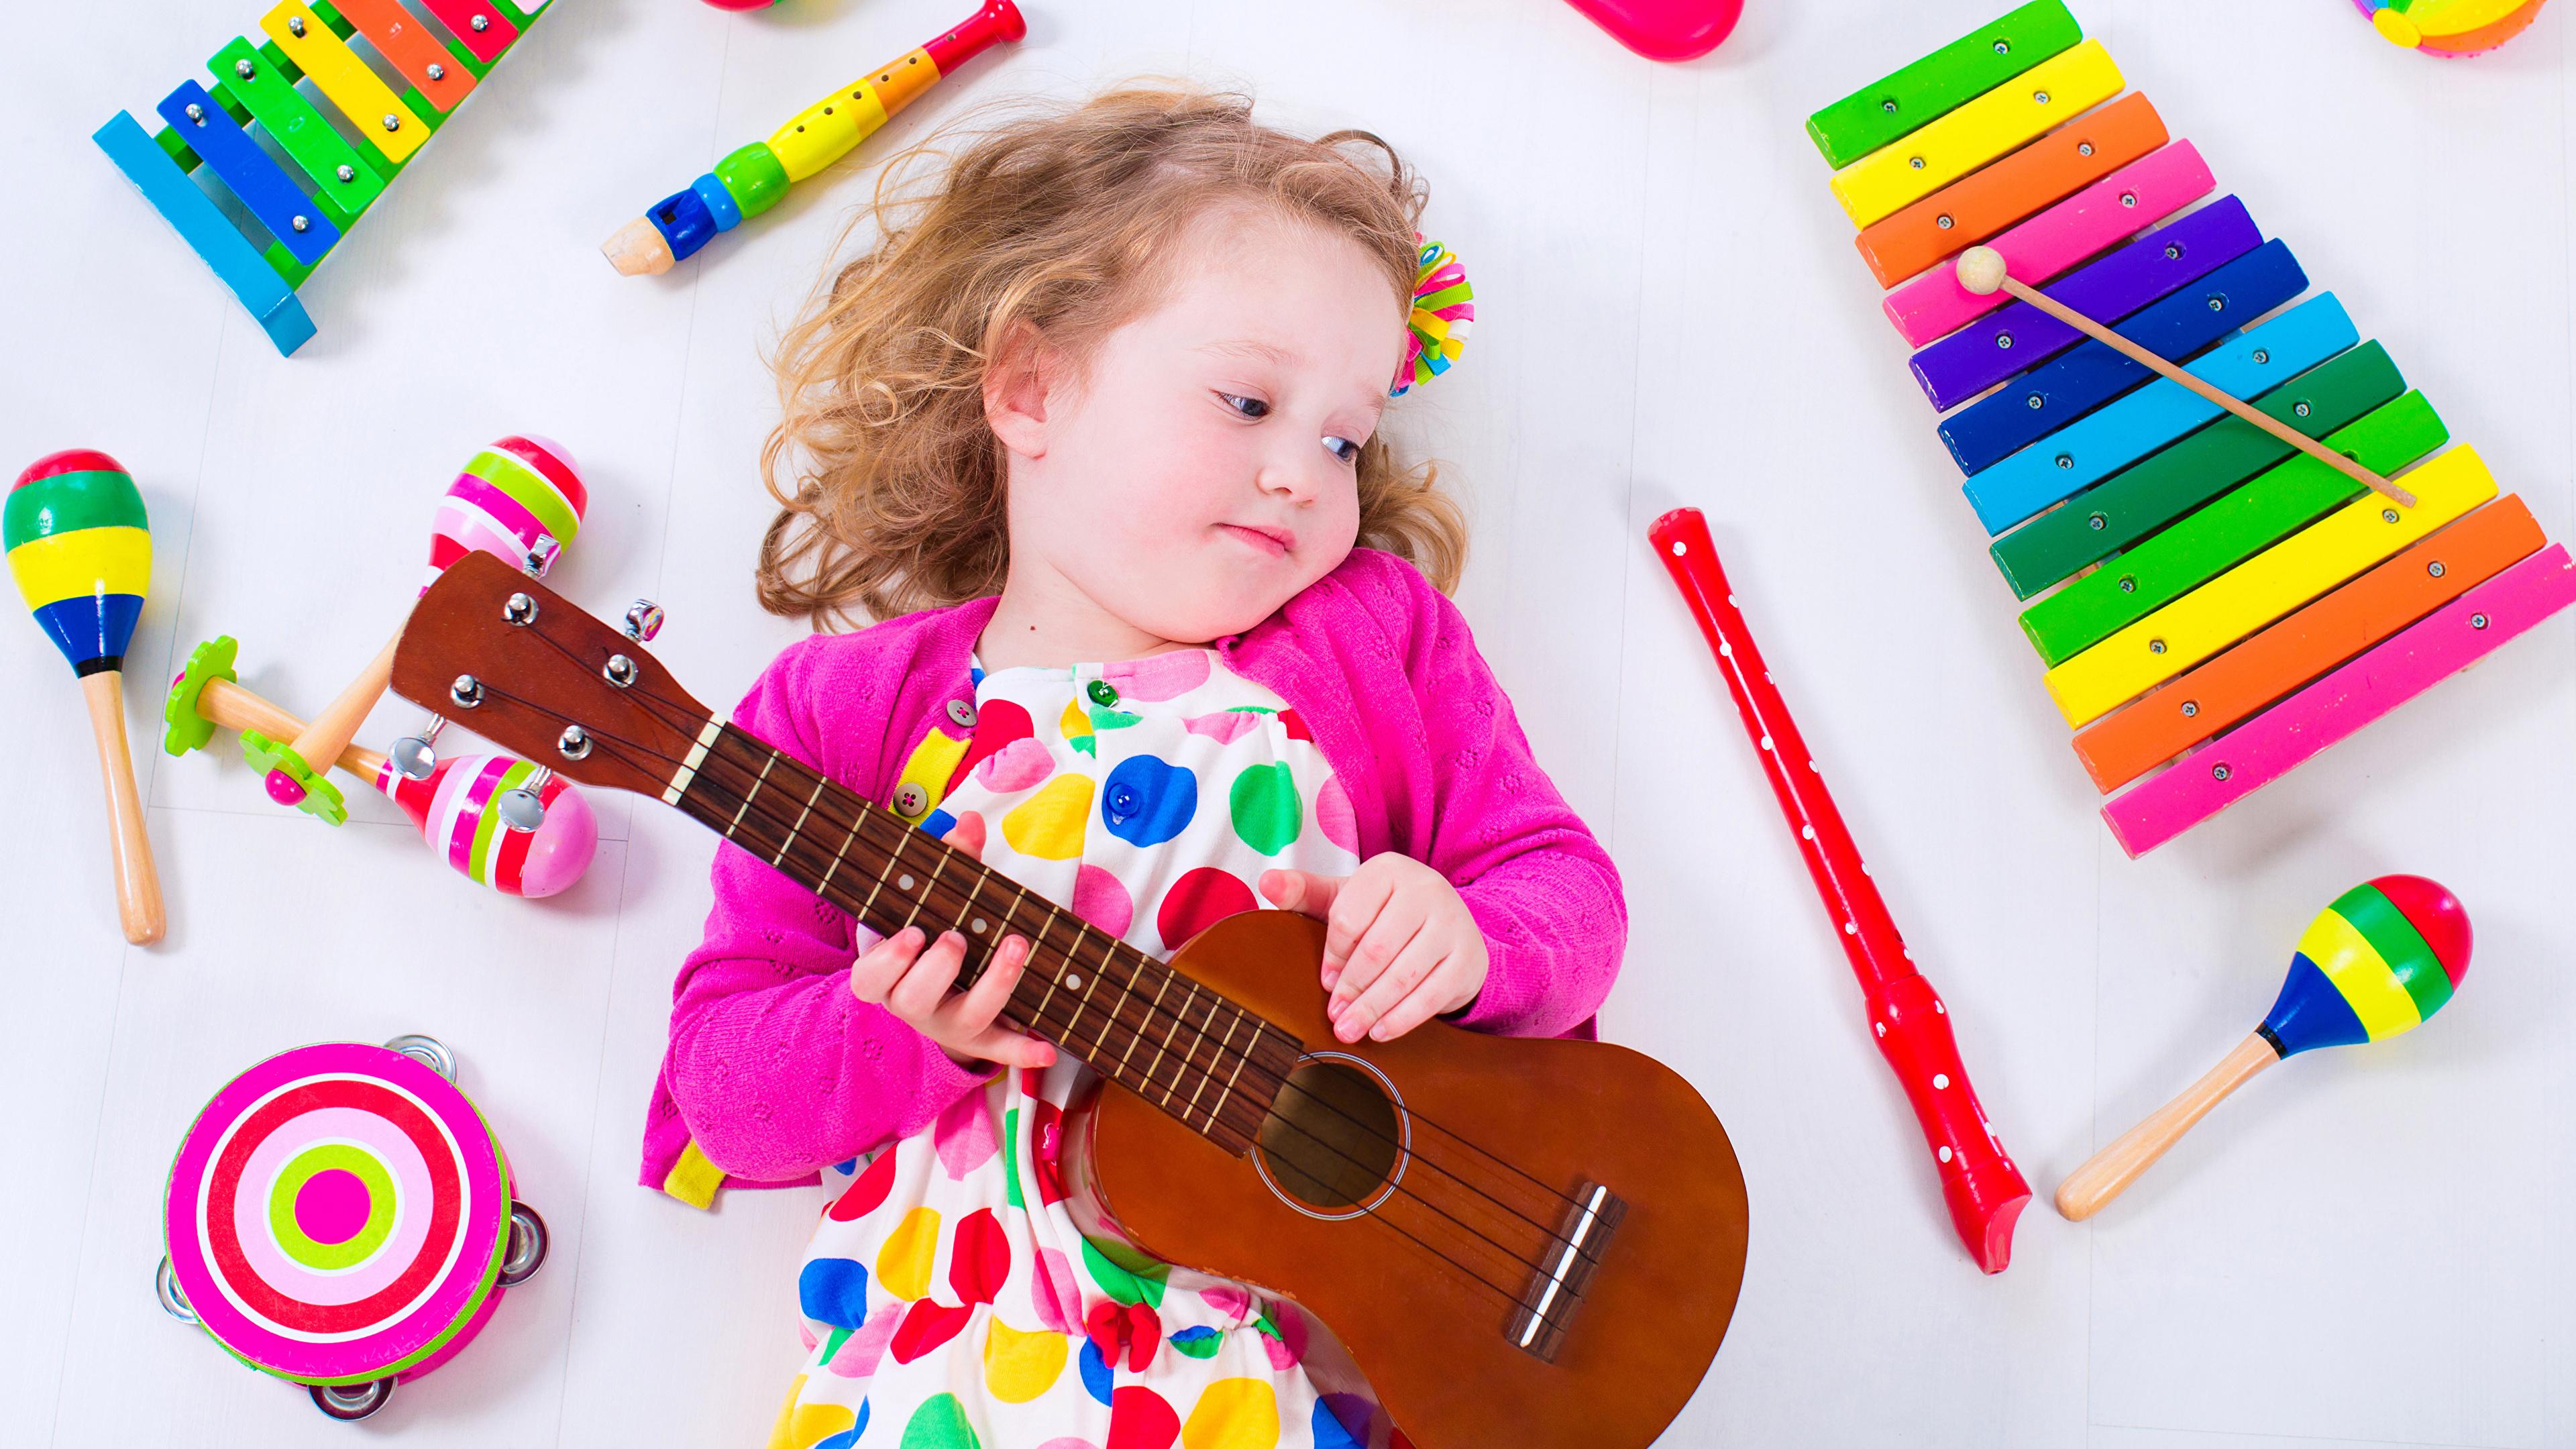 Image Little girls Guitar Children Toys White background 3840x2160